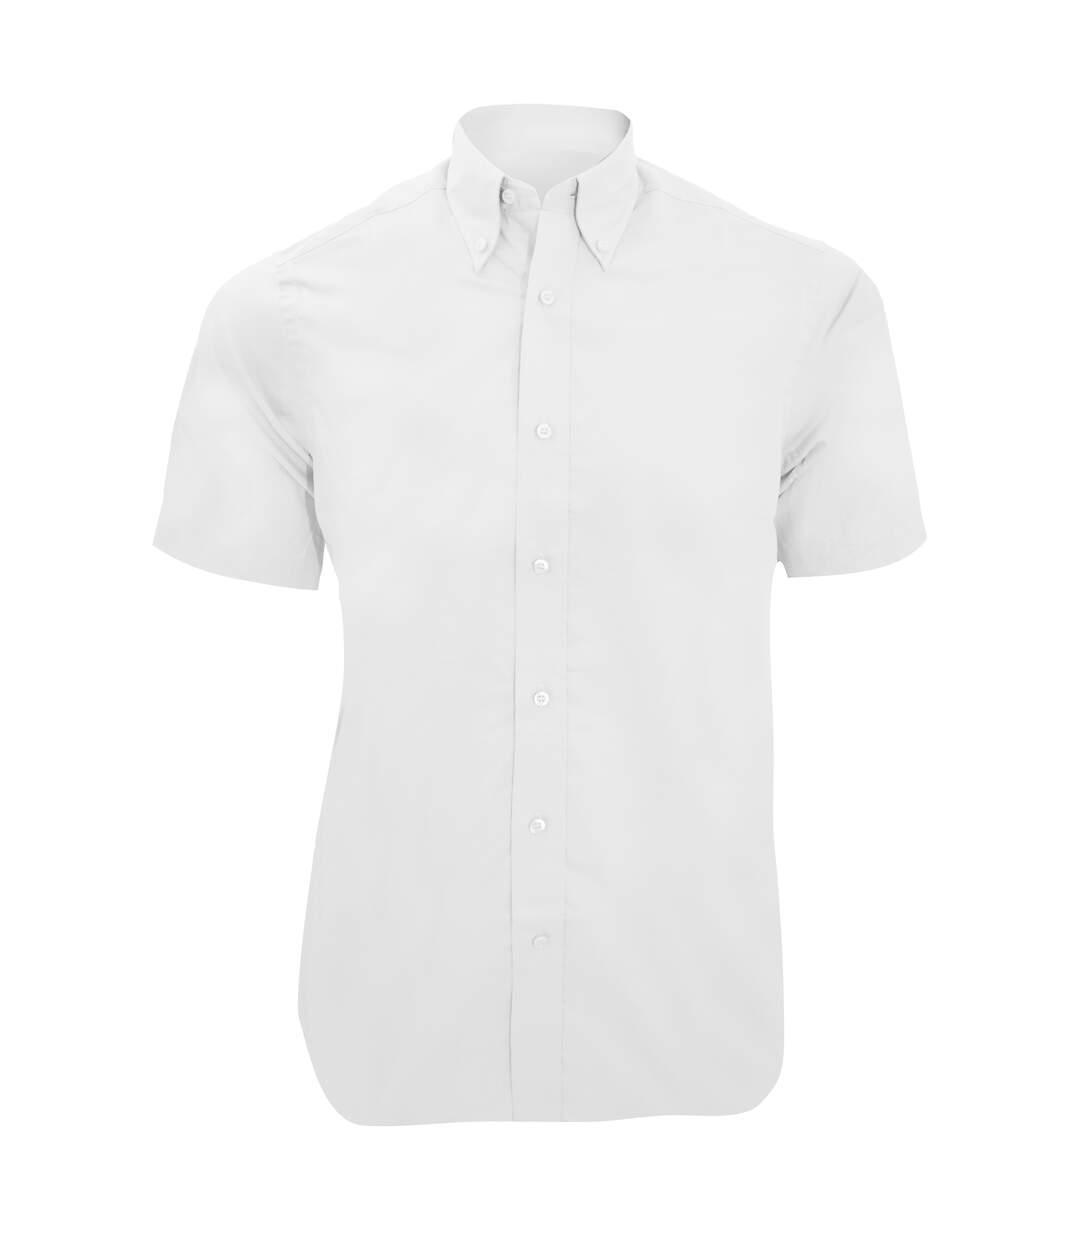 Kustom Kit - Chemise à manches courtes - Homme (Blanc) - UTBC1448